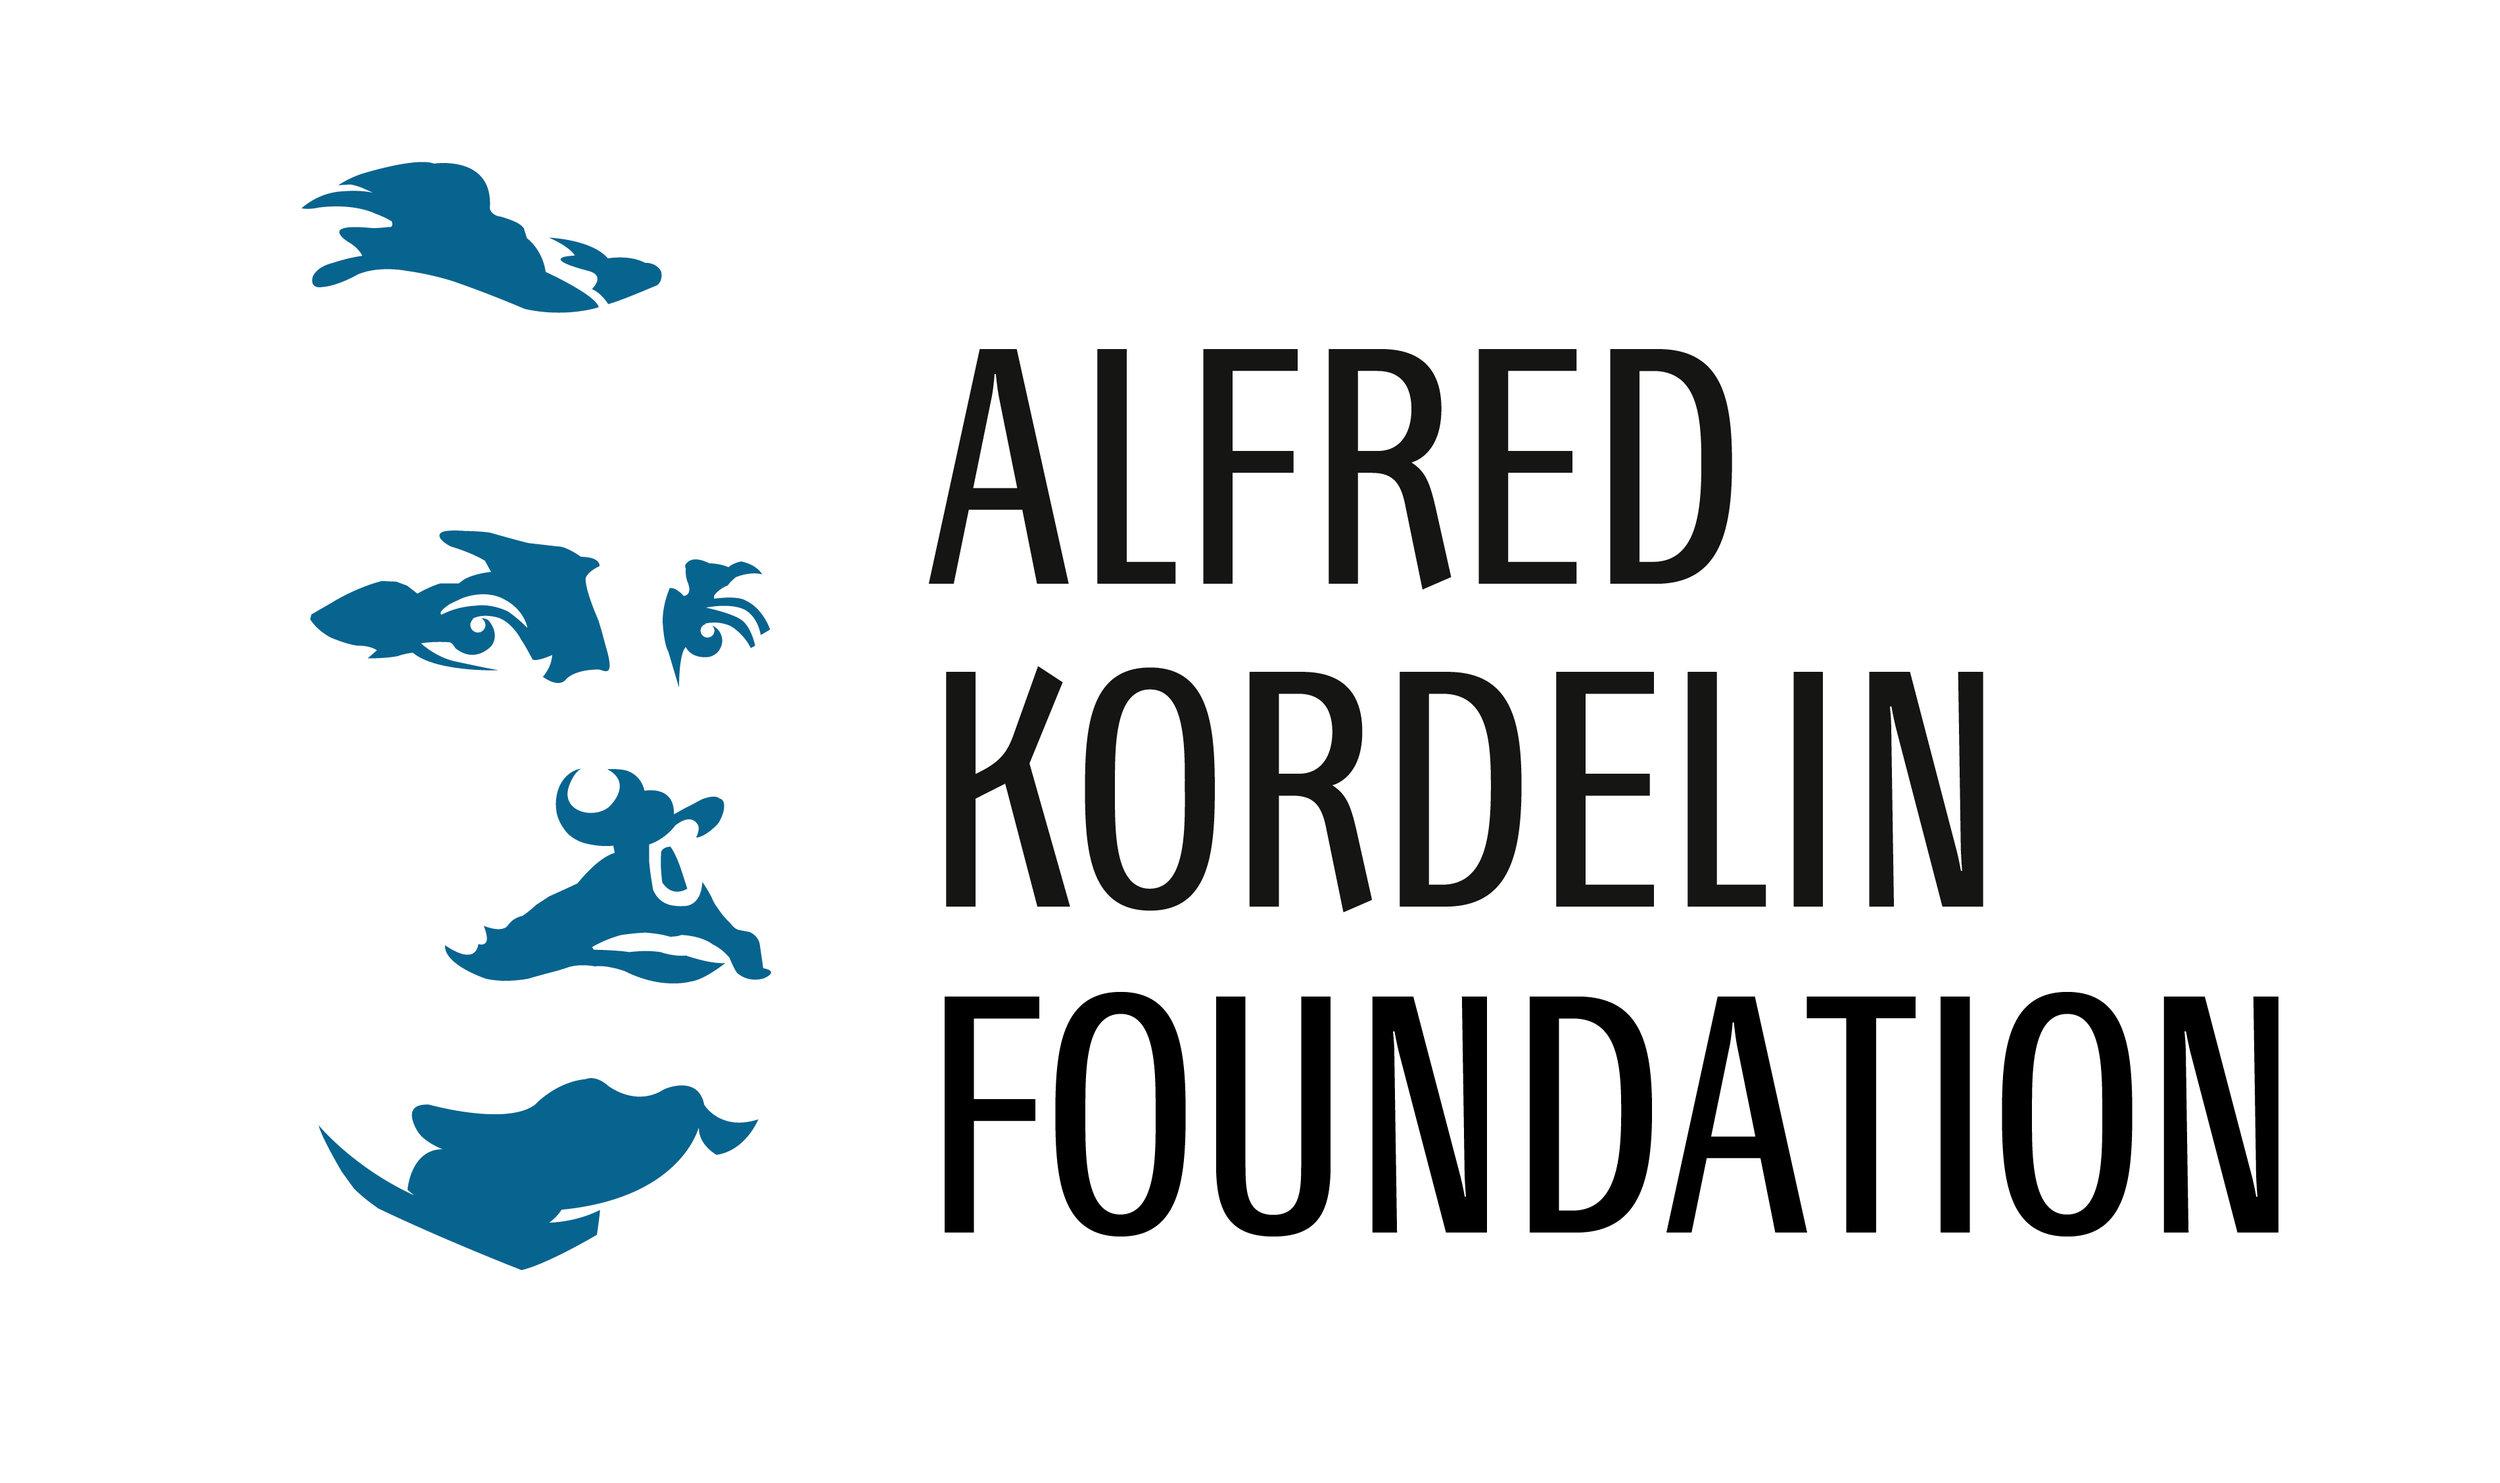 Alfred-Kordelin-Foundation.jpg